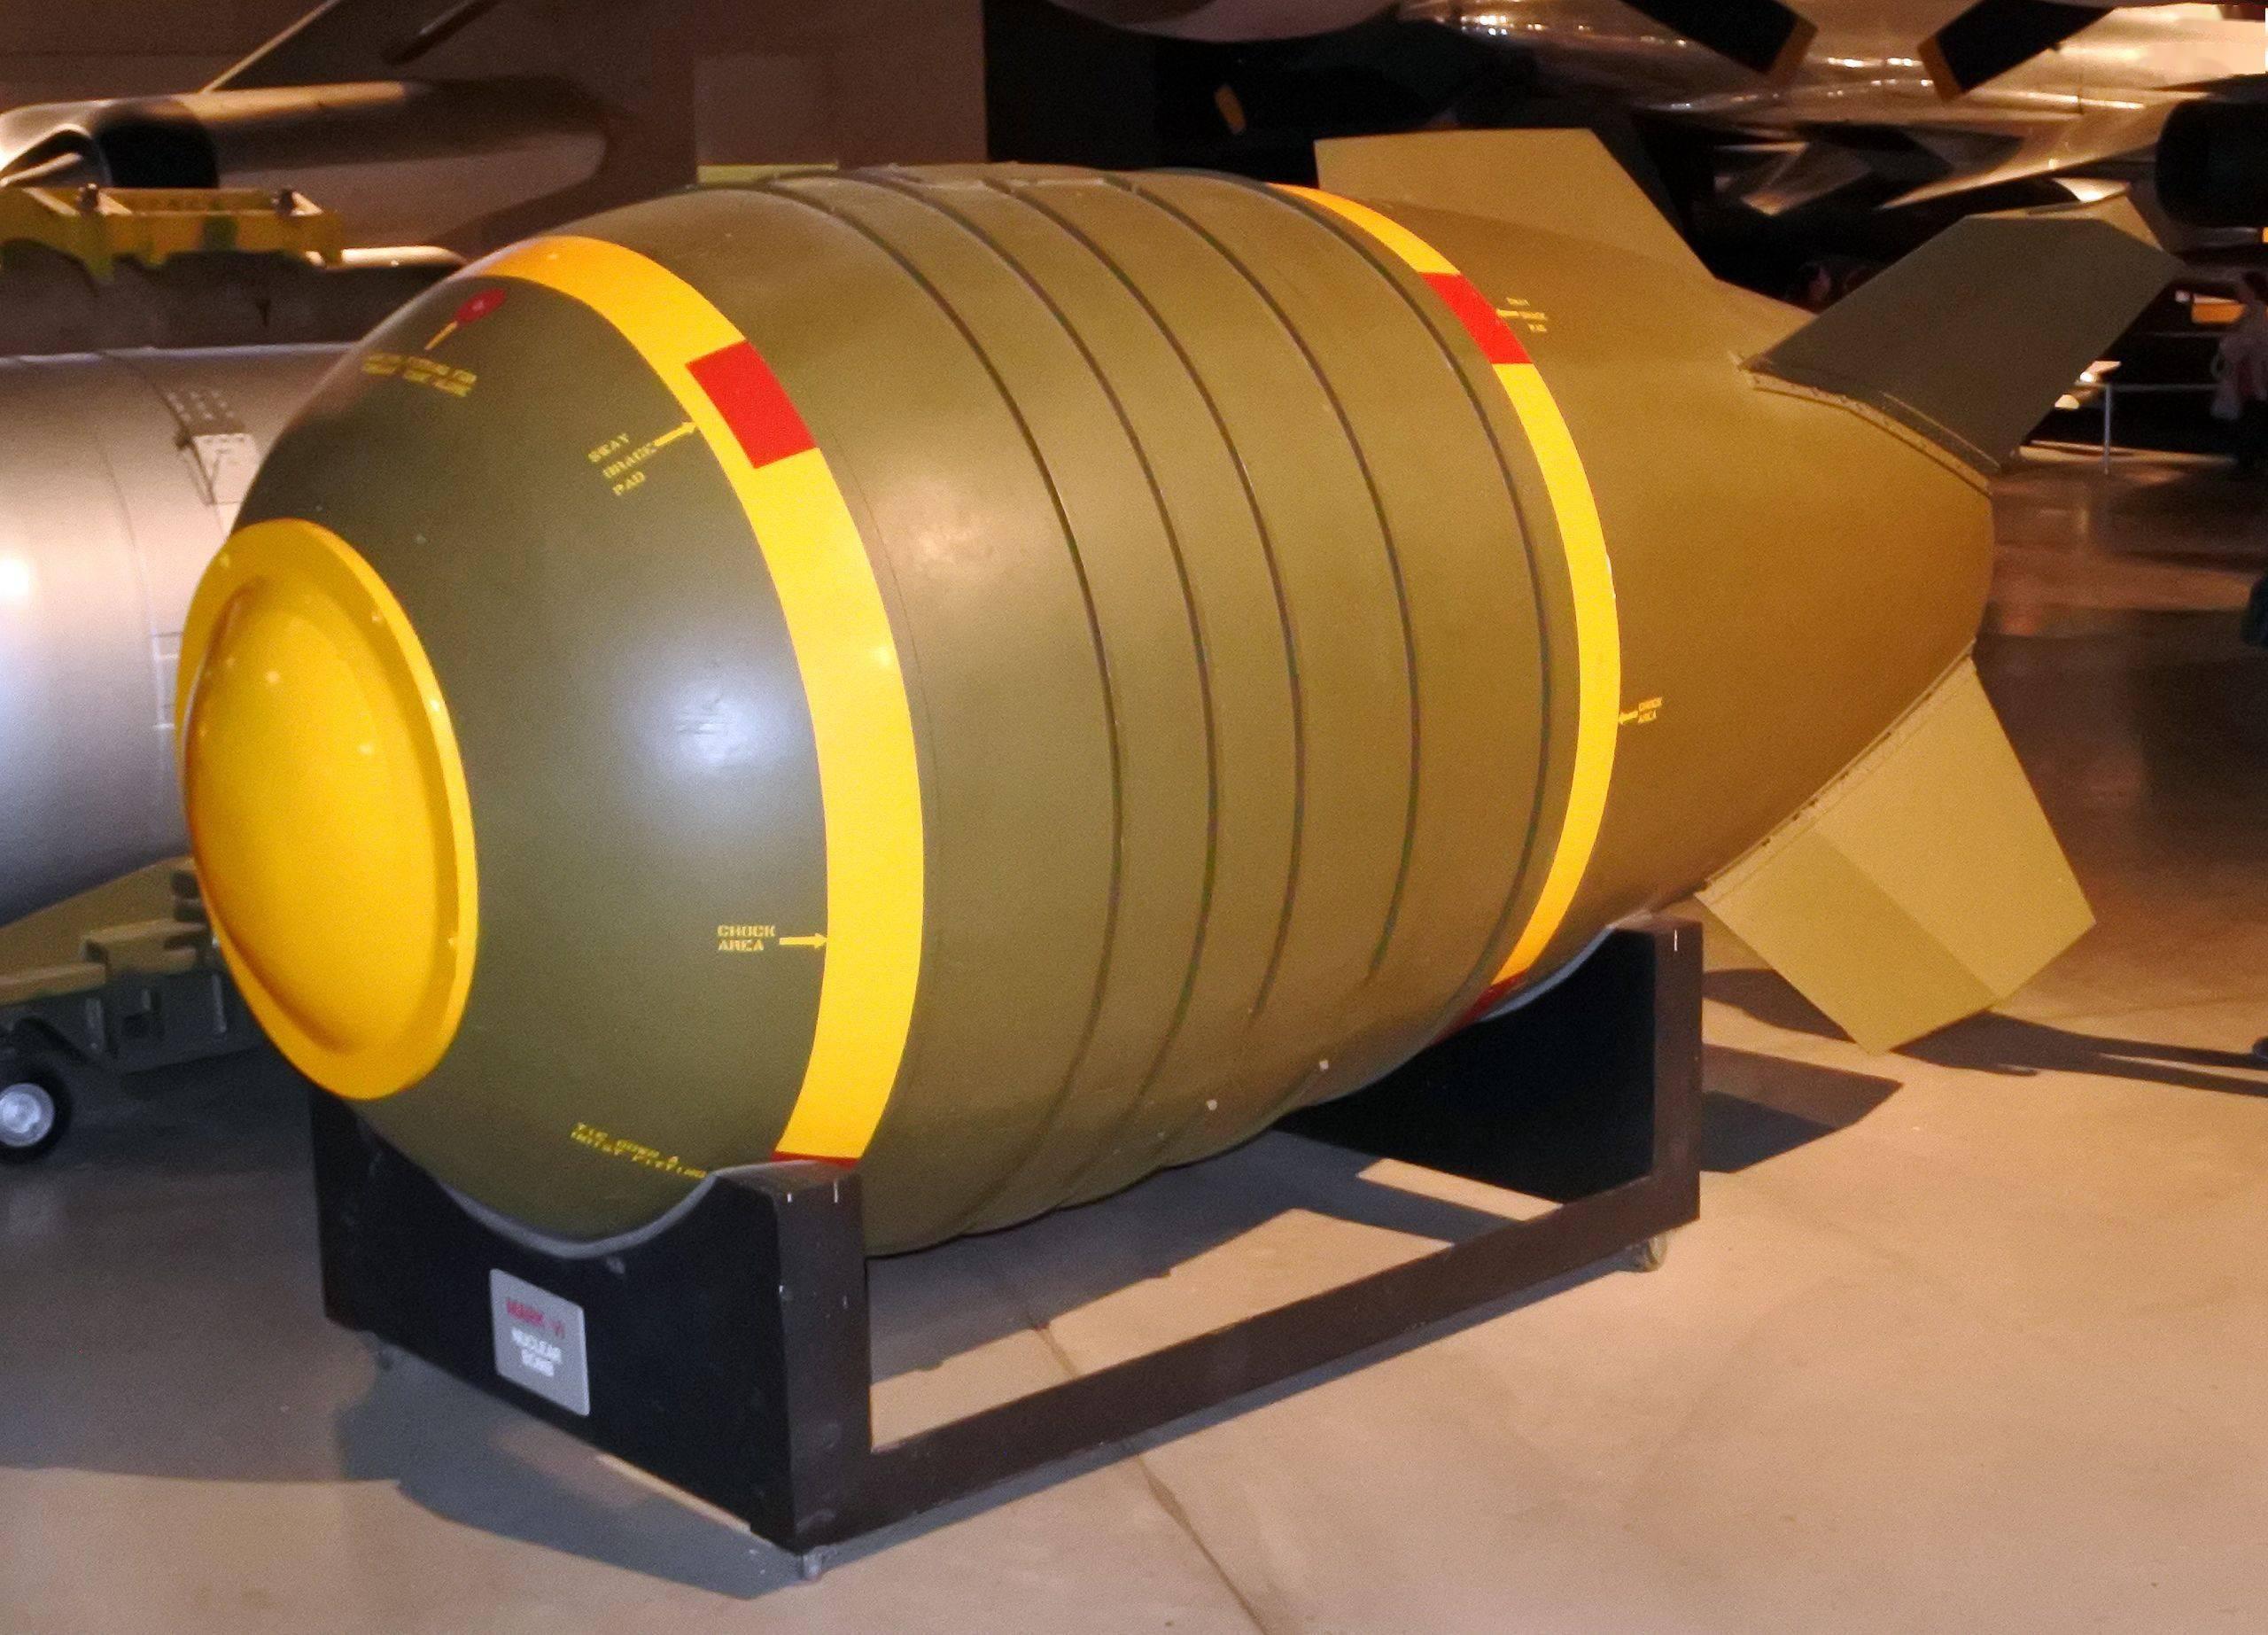 Mark-6 (MK6) nuclear bomb